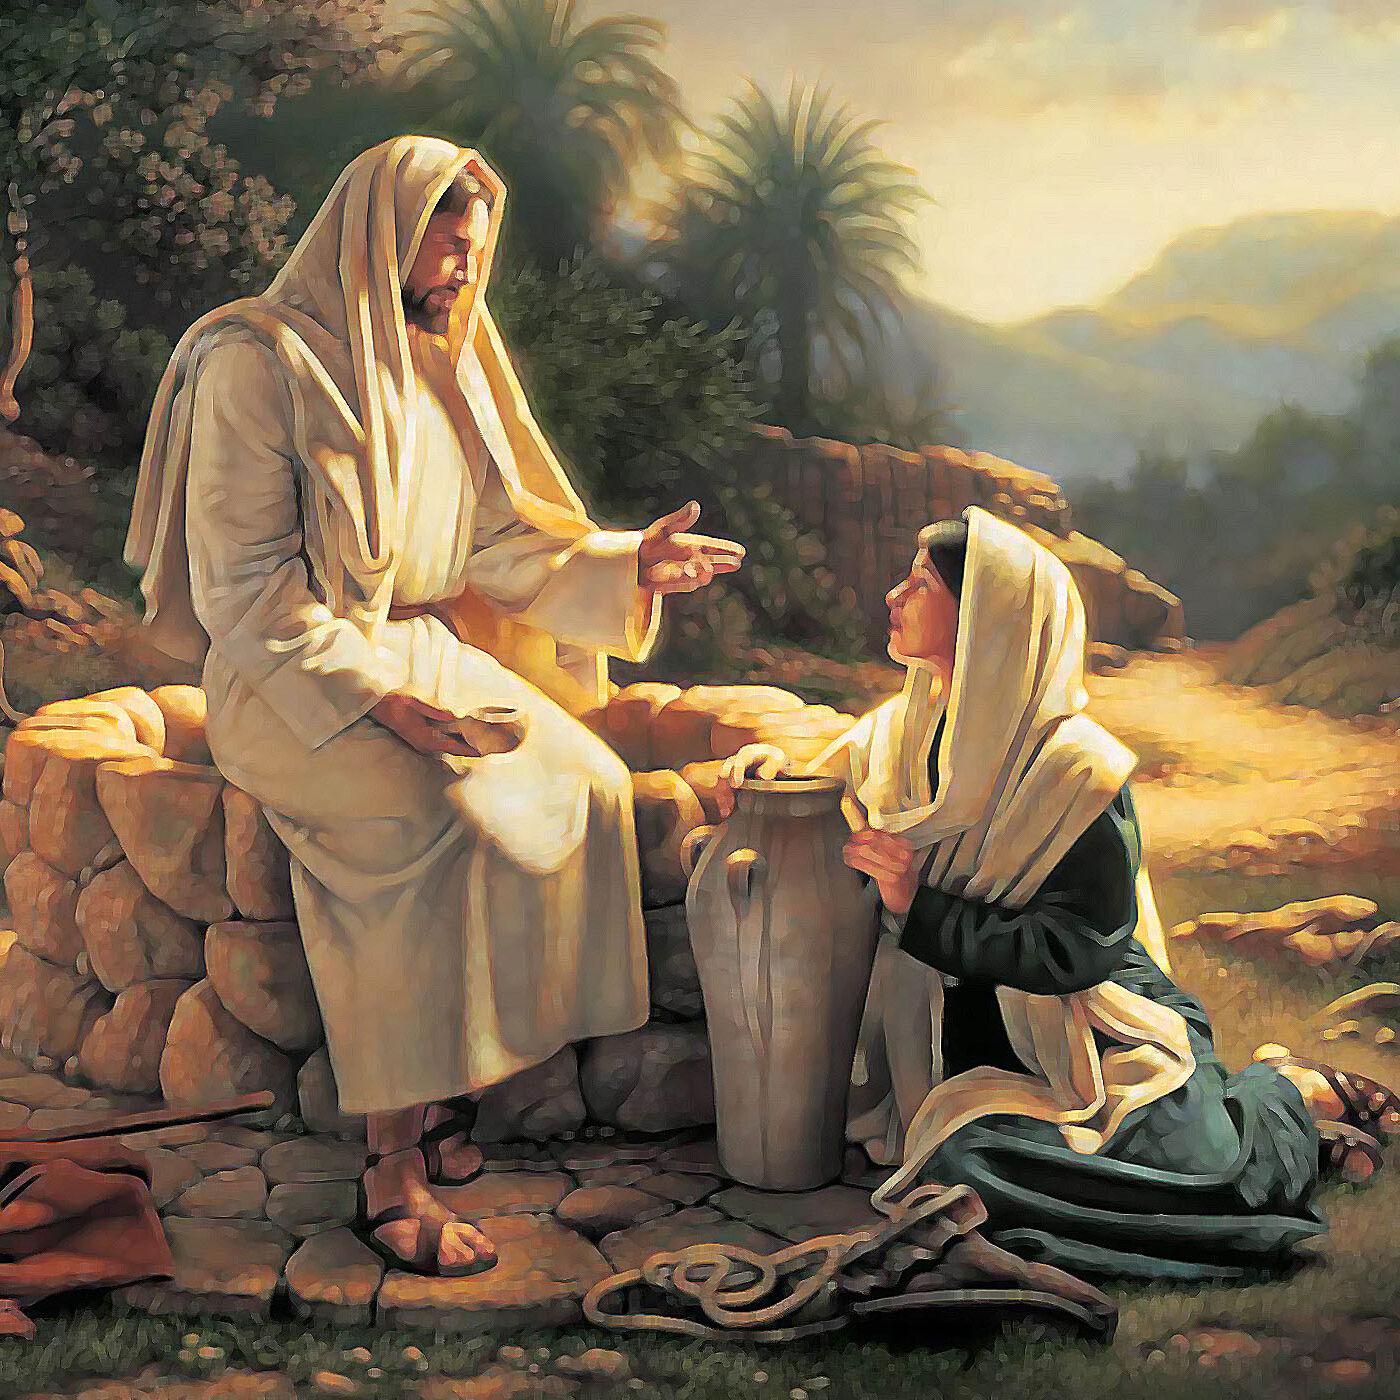 riflessioni sul Vangelo di Mercoledì 10 Febbraio 2021 (Mc 7, 14-23)